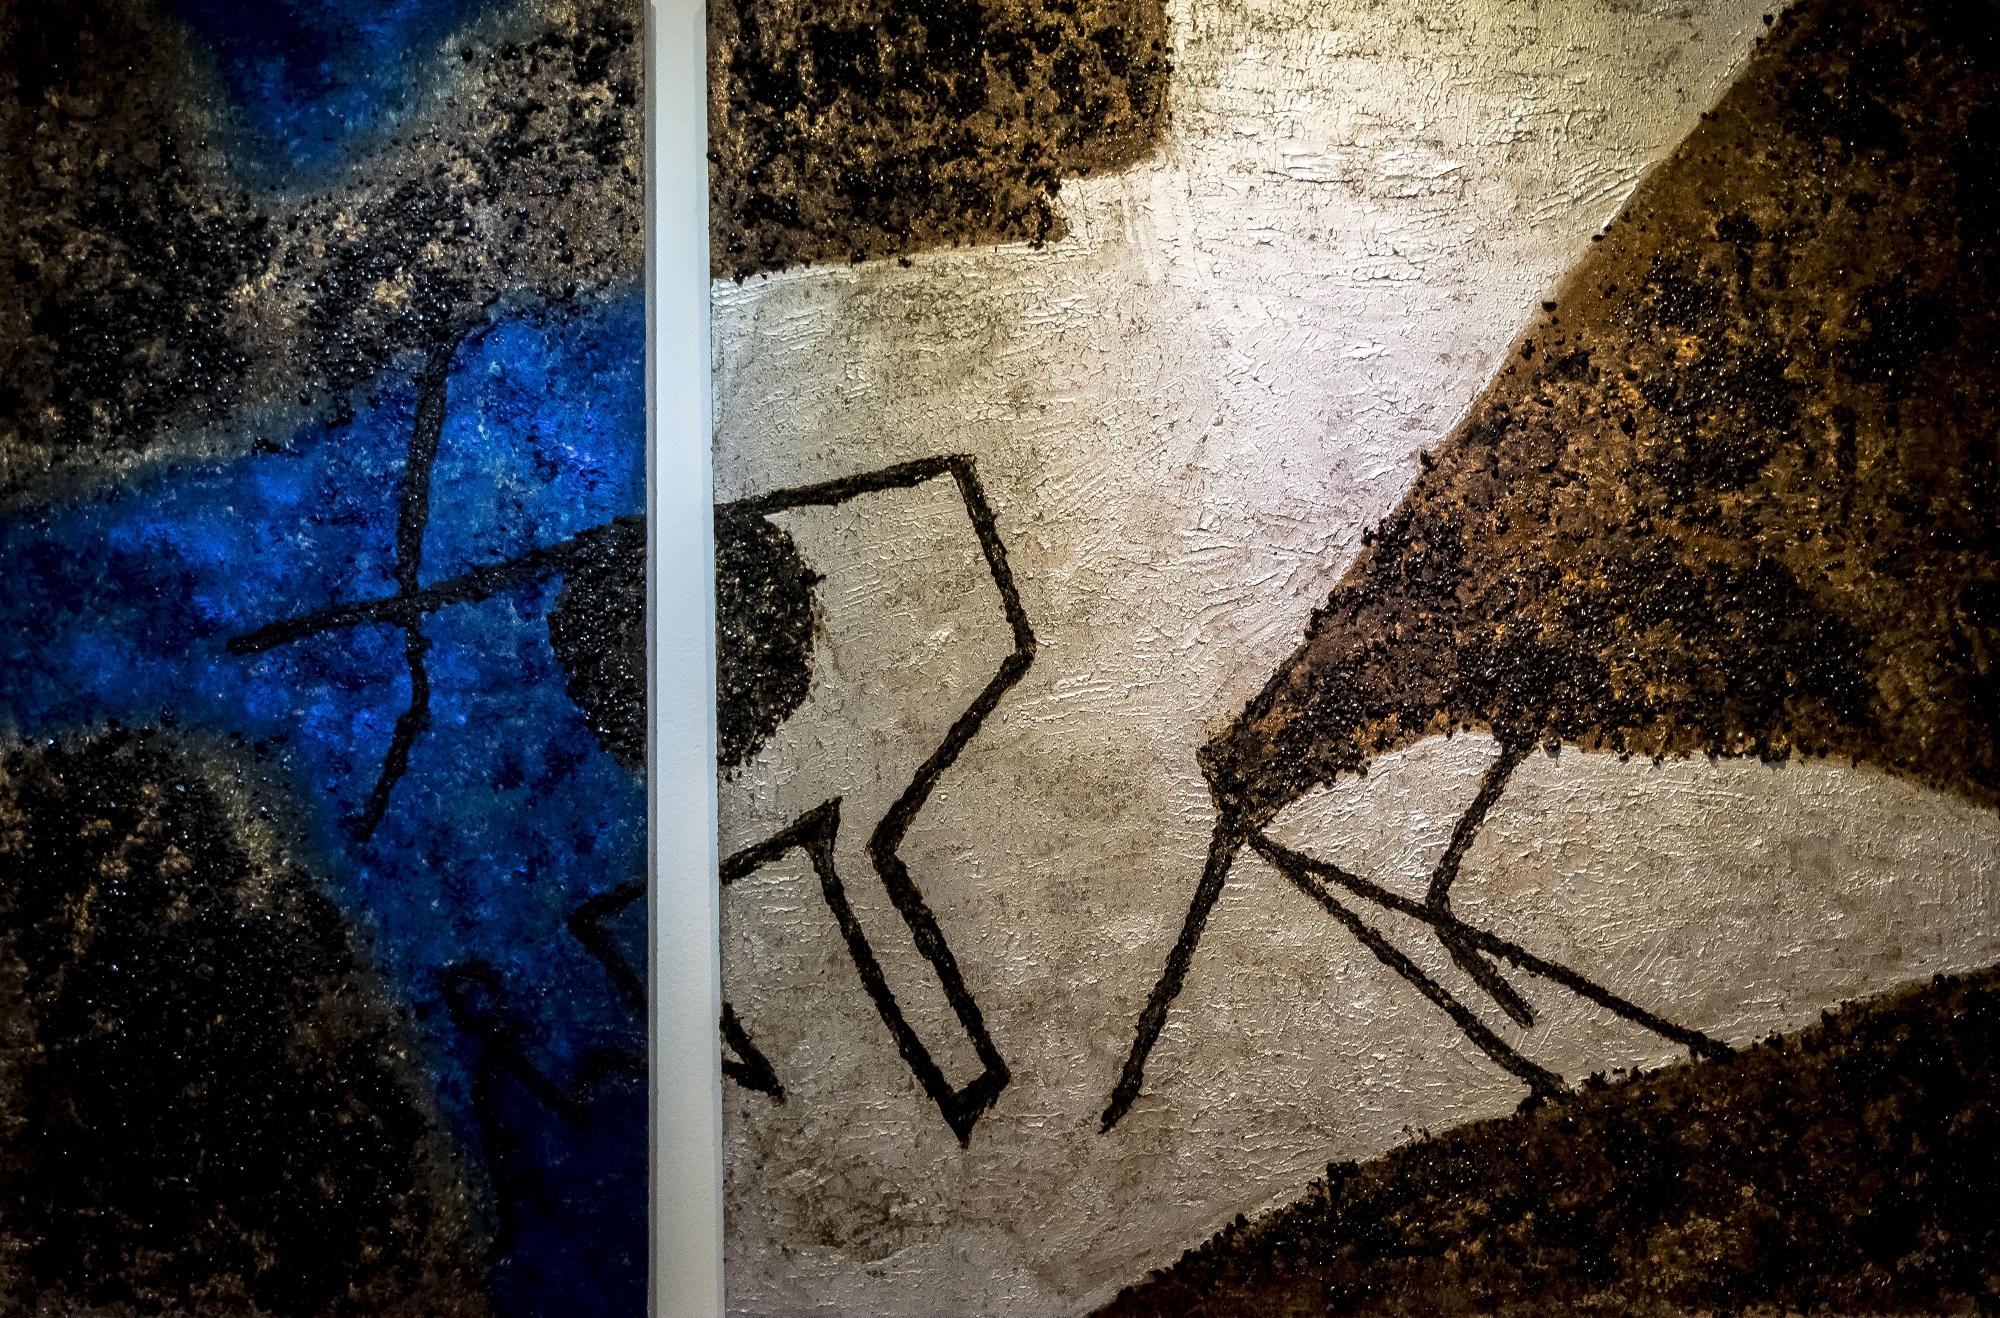 Díptico/ Óleo y café sobre lienzo/ 100 x 180 cm/ Charo Artadi/ Perú 2018